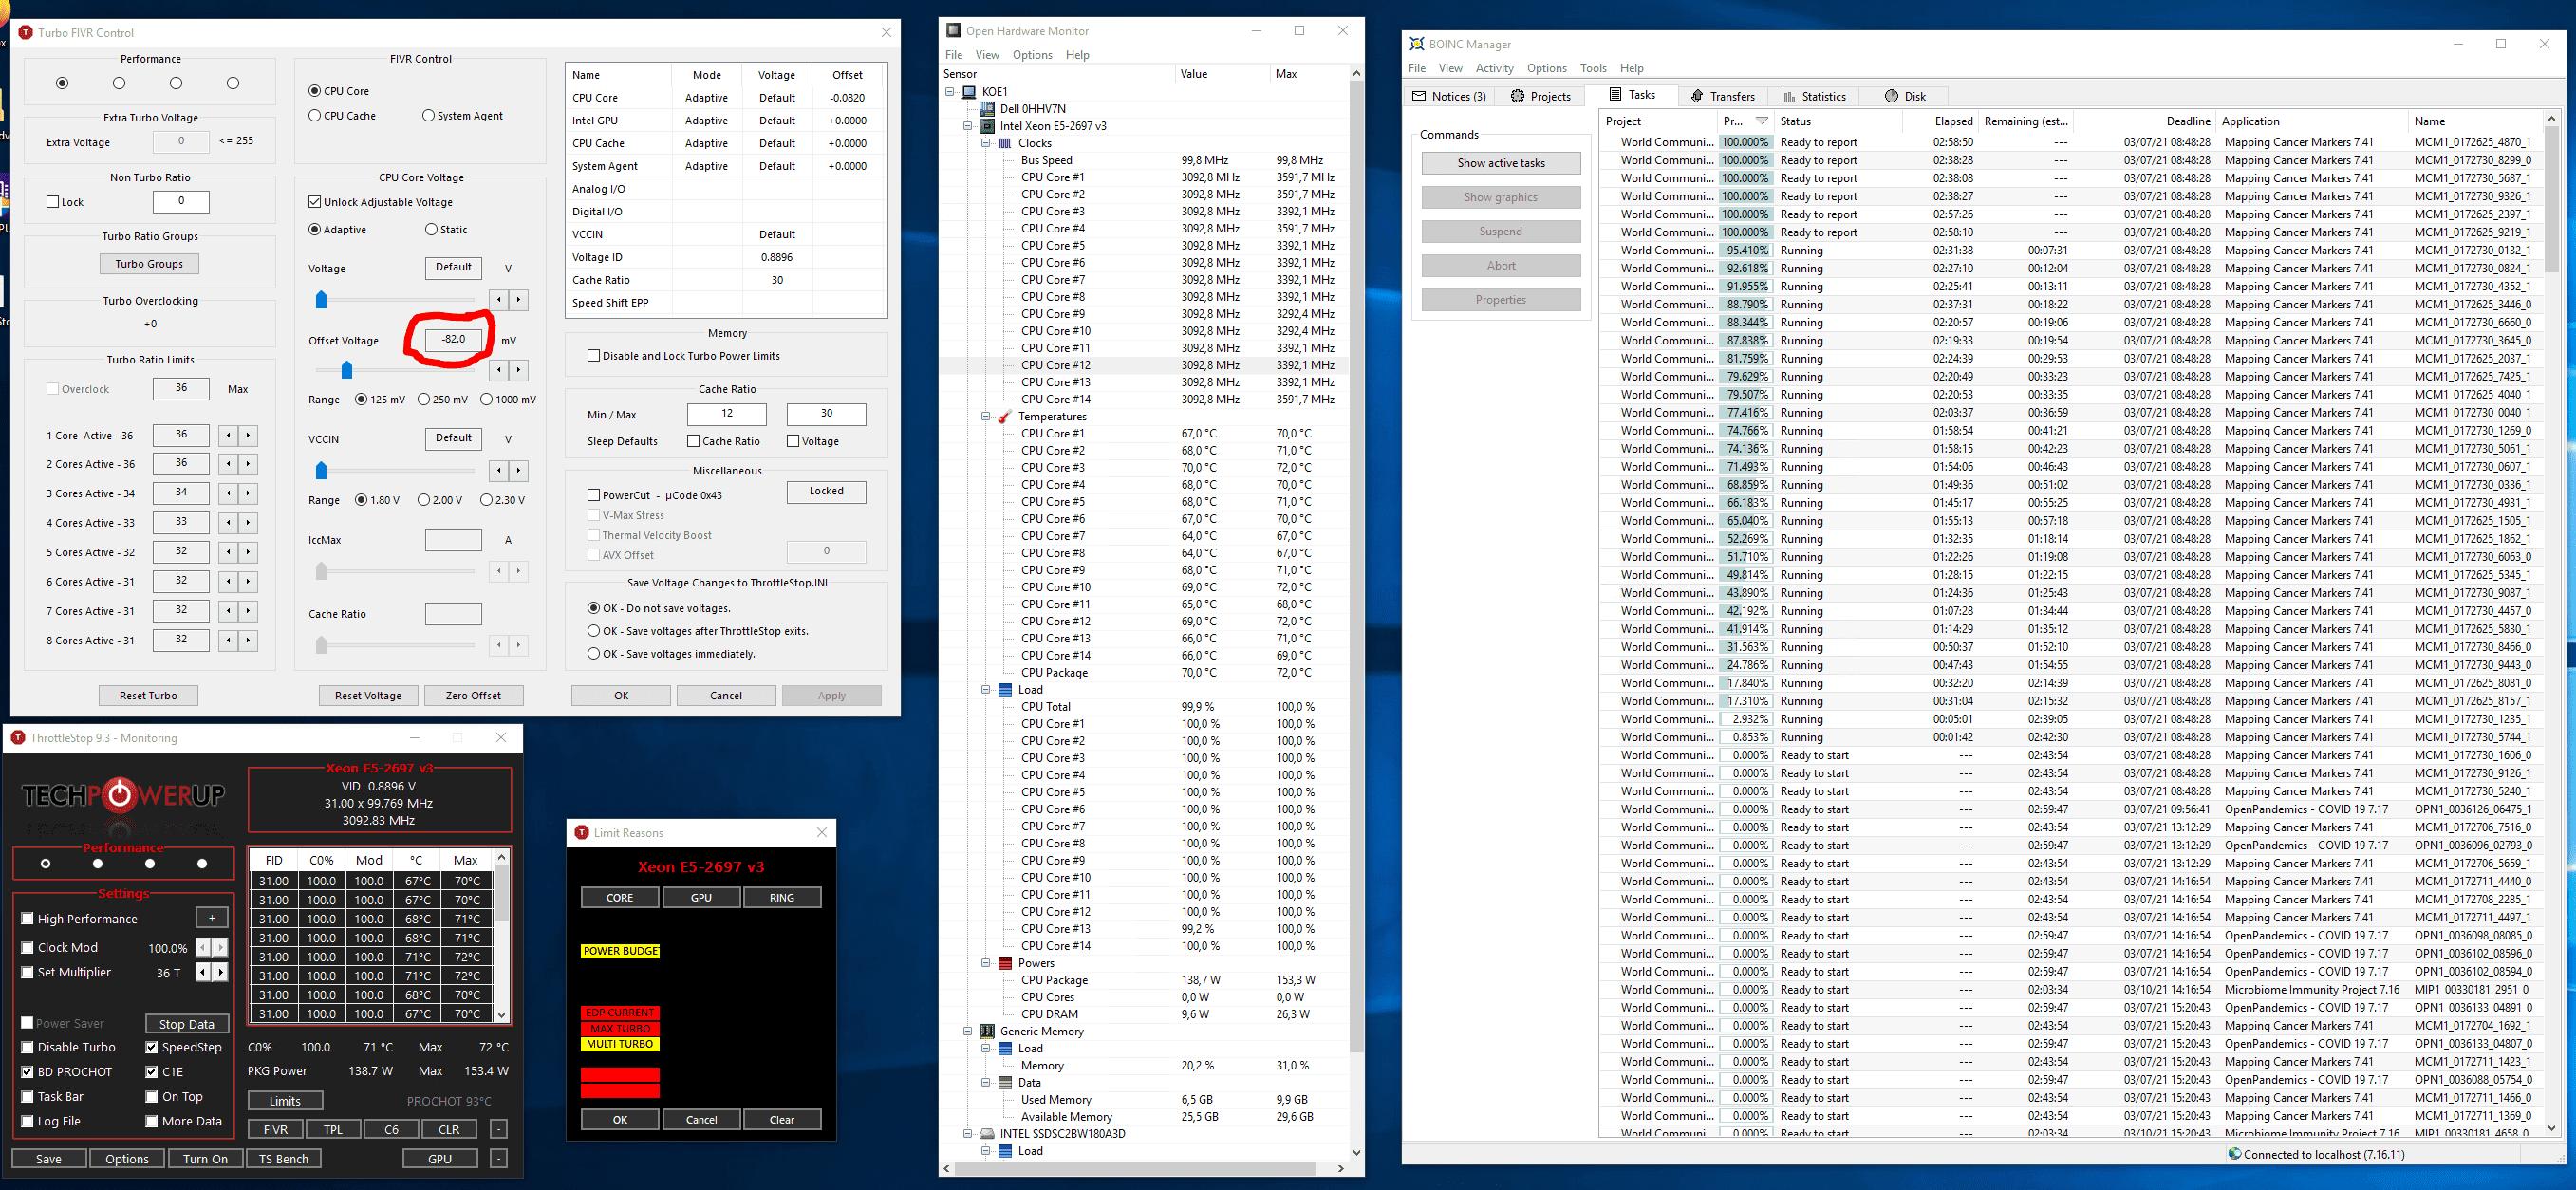 https://tweakers.net/i/Kj-1Nnhgci7G_TWWDYZ_QQiajII=/full-fit-in/4000x4000/filters:no_upscale():fill(white):strip_exif()/f/image/AK4XNbFIUM5U7QU9LBnl1eVK.png?f=user_large